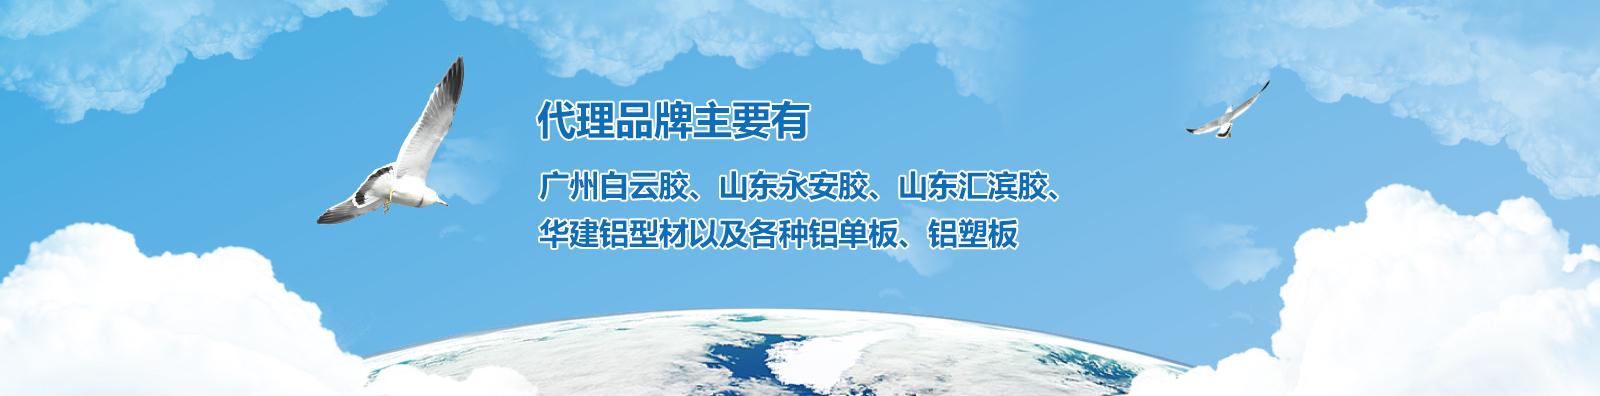 url(http://www.yonganmuqiang.com/upfile/ads/20150925095721-10176809877157212.jpg)